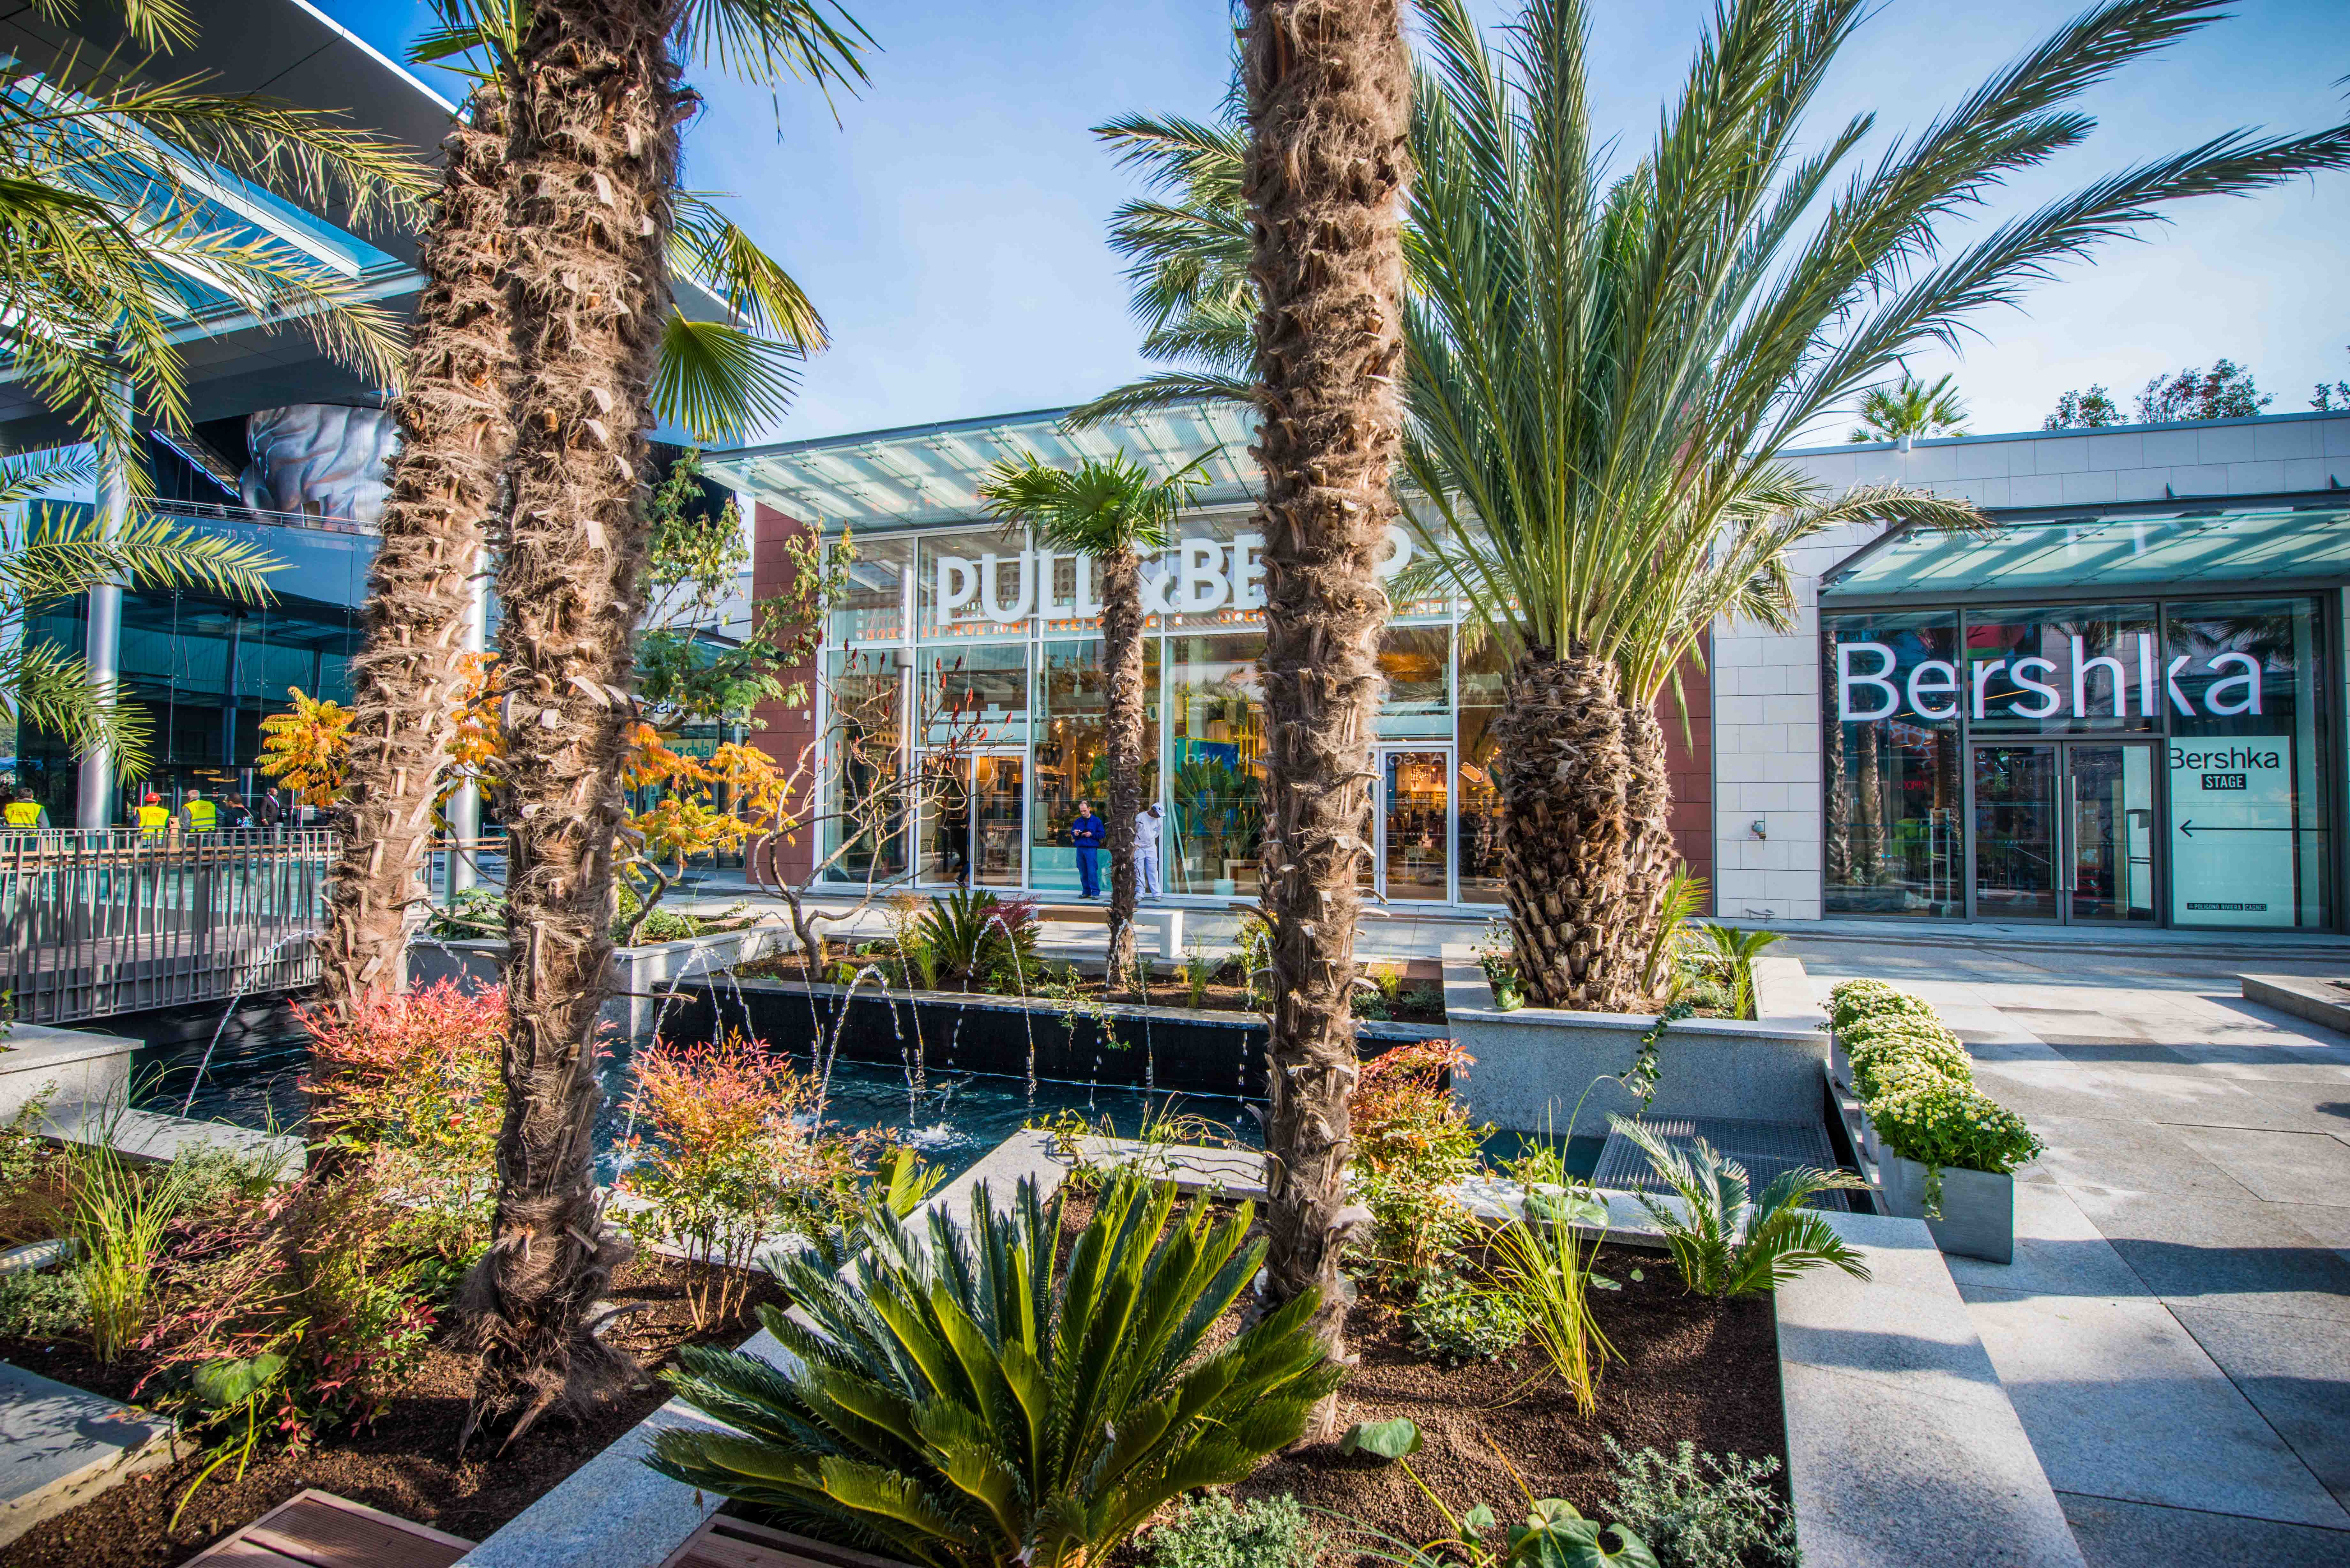 blog mister riviera c te d 39 azur polygone riviera ouvre ses portes cagnes sur mer. Black Bedroom Furniture Sets. Home Design Ideas